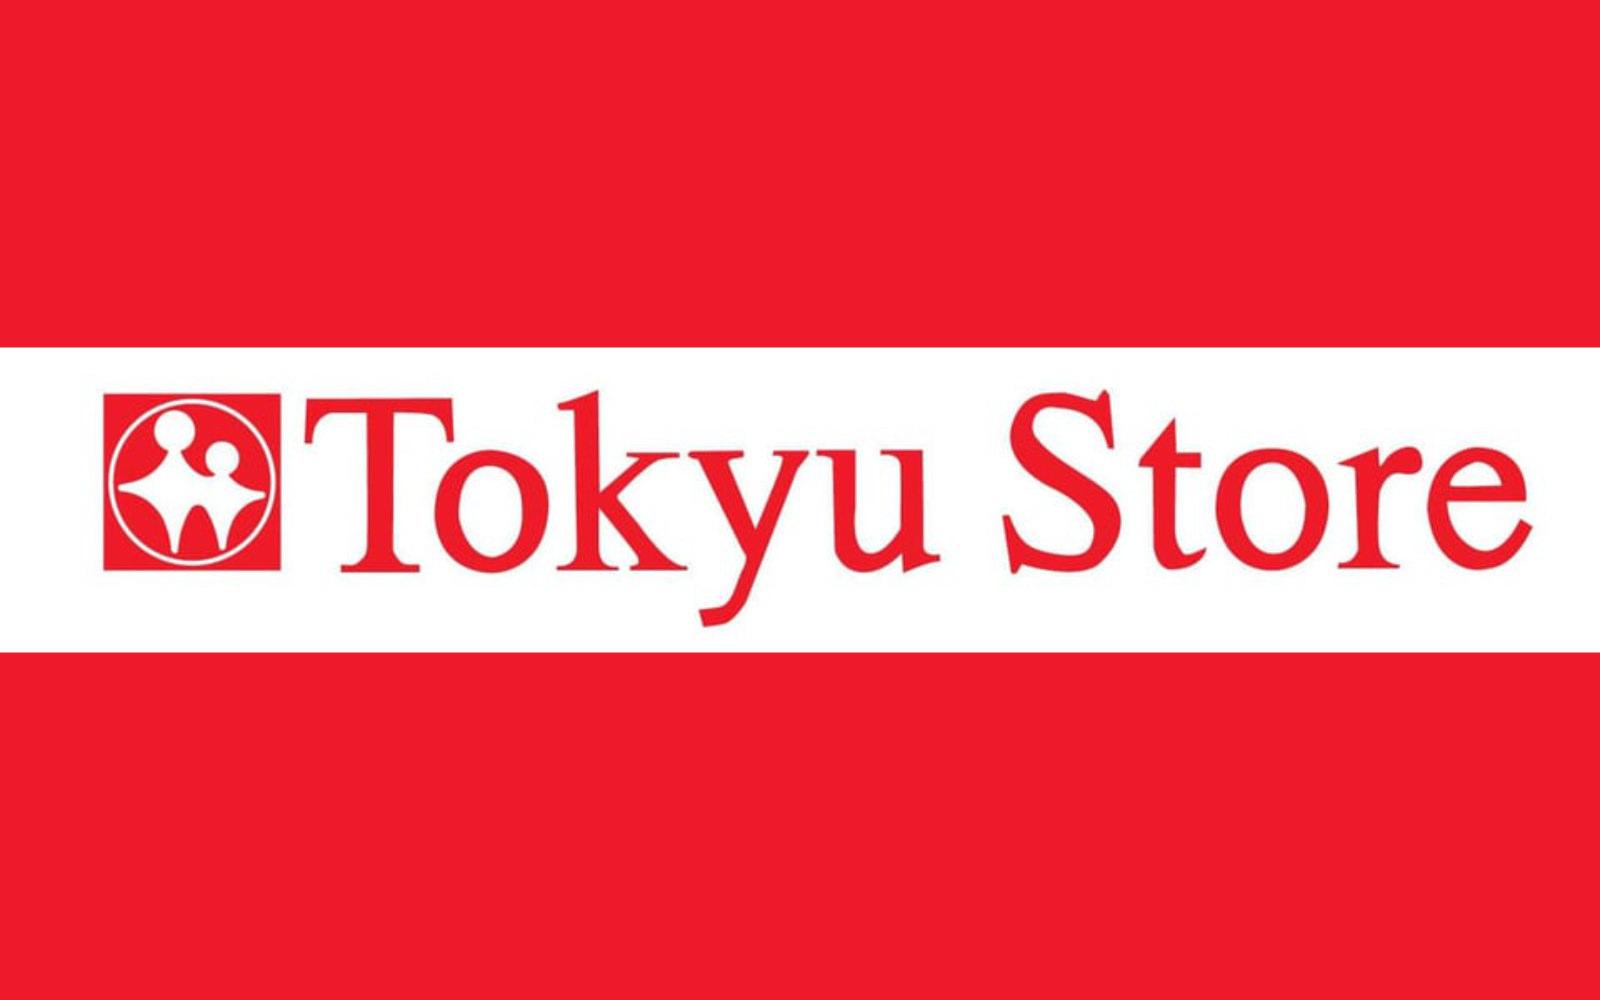 Toukyu-Store-Paypay.jpg